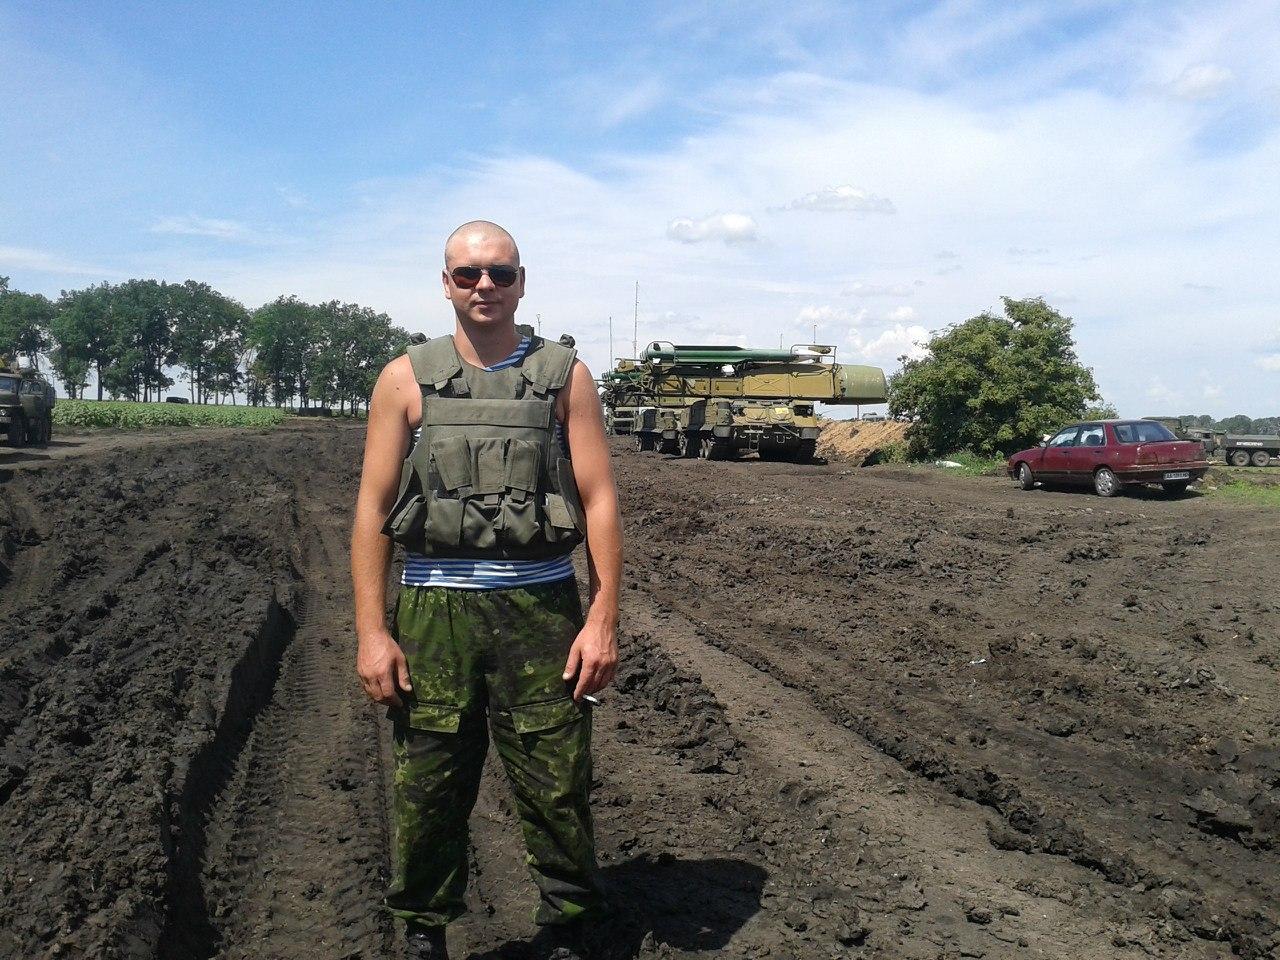 Добавлена 30 августа 2014 Николай Богатырёв